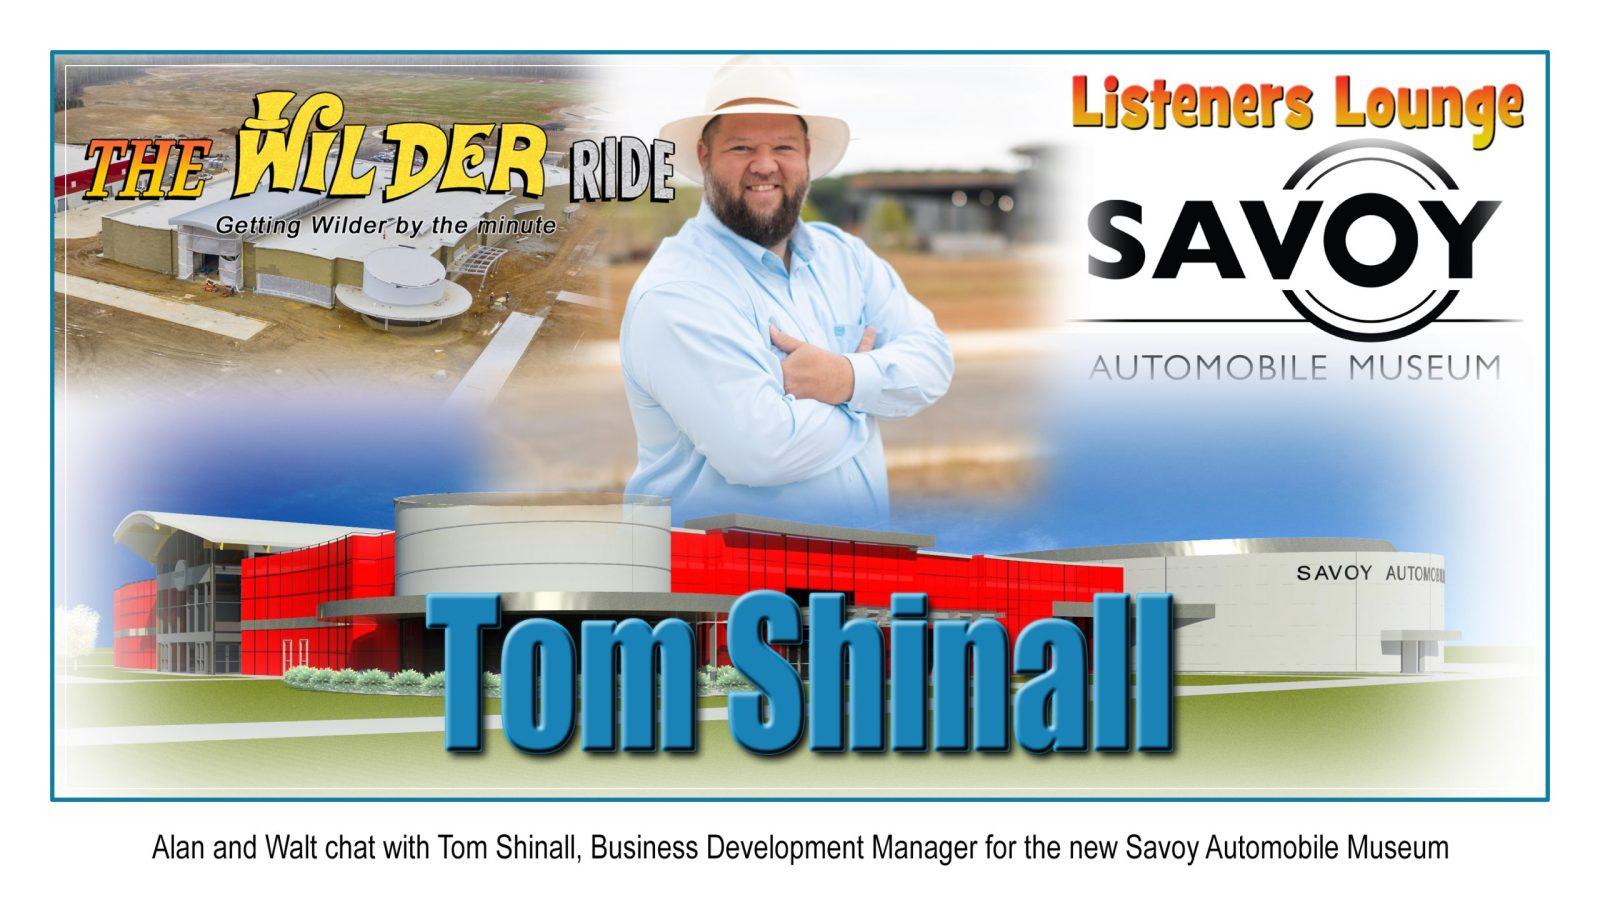 Tom Shinall